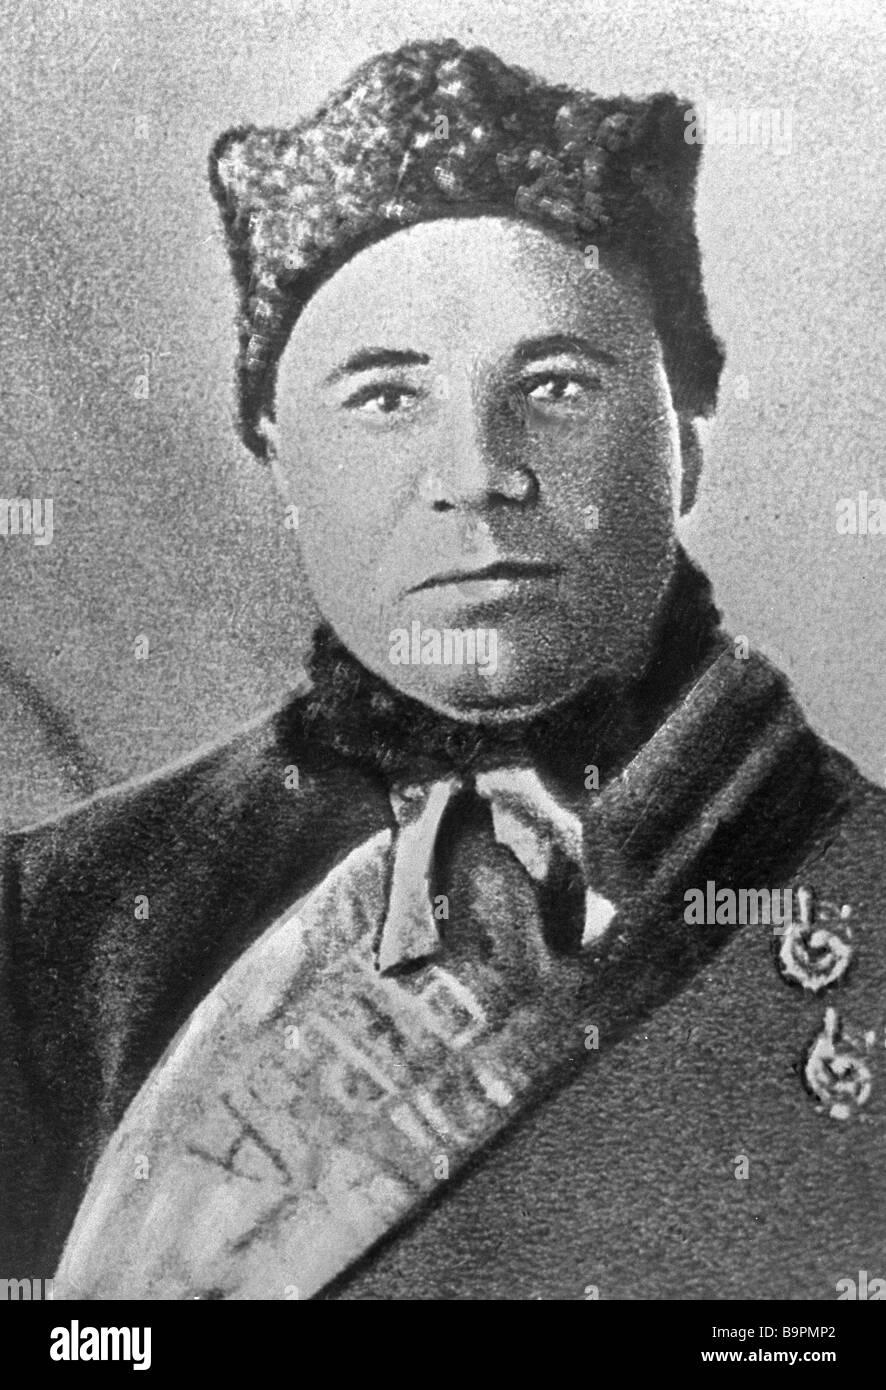 Iosif Apanasenko division commander 1st Cavalry Army - Stock Image